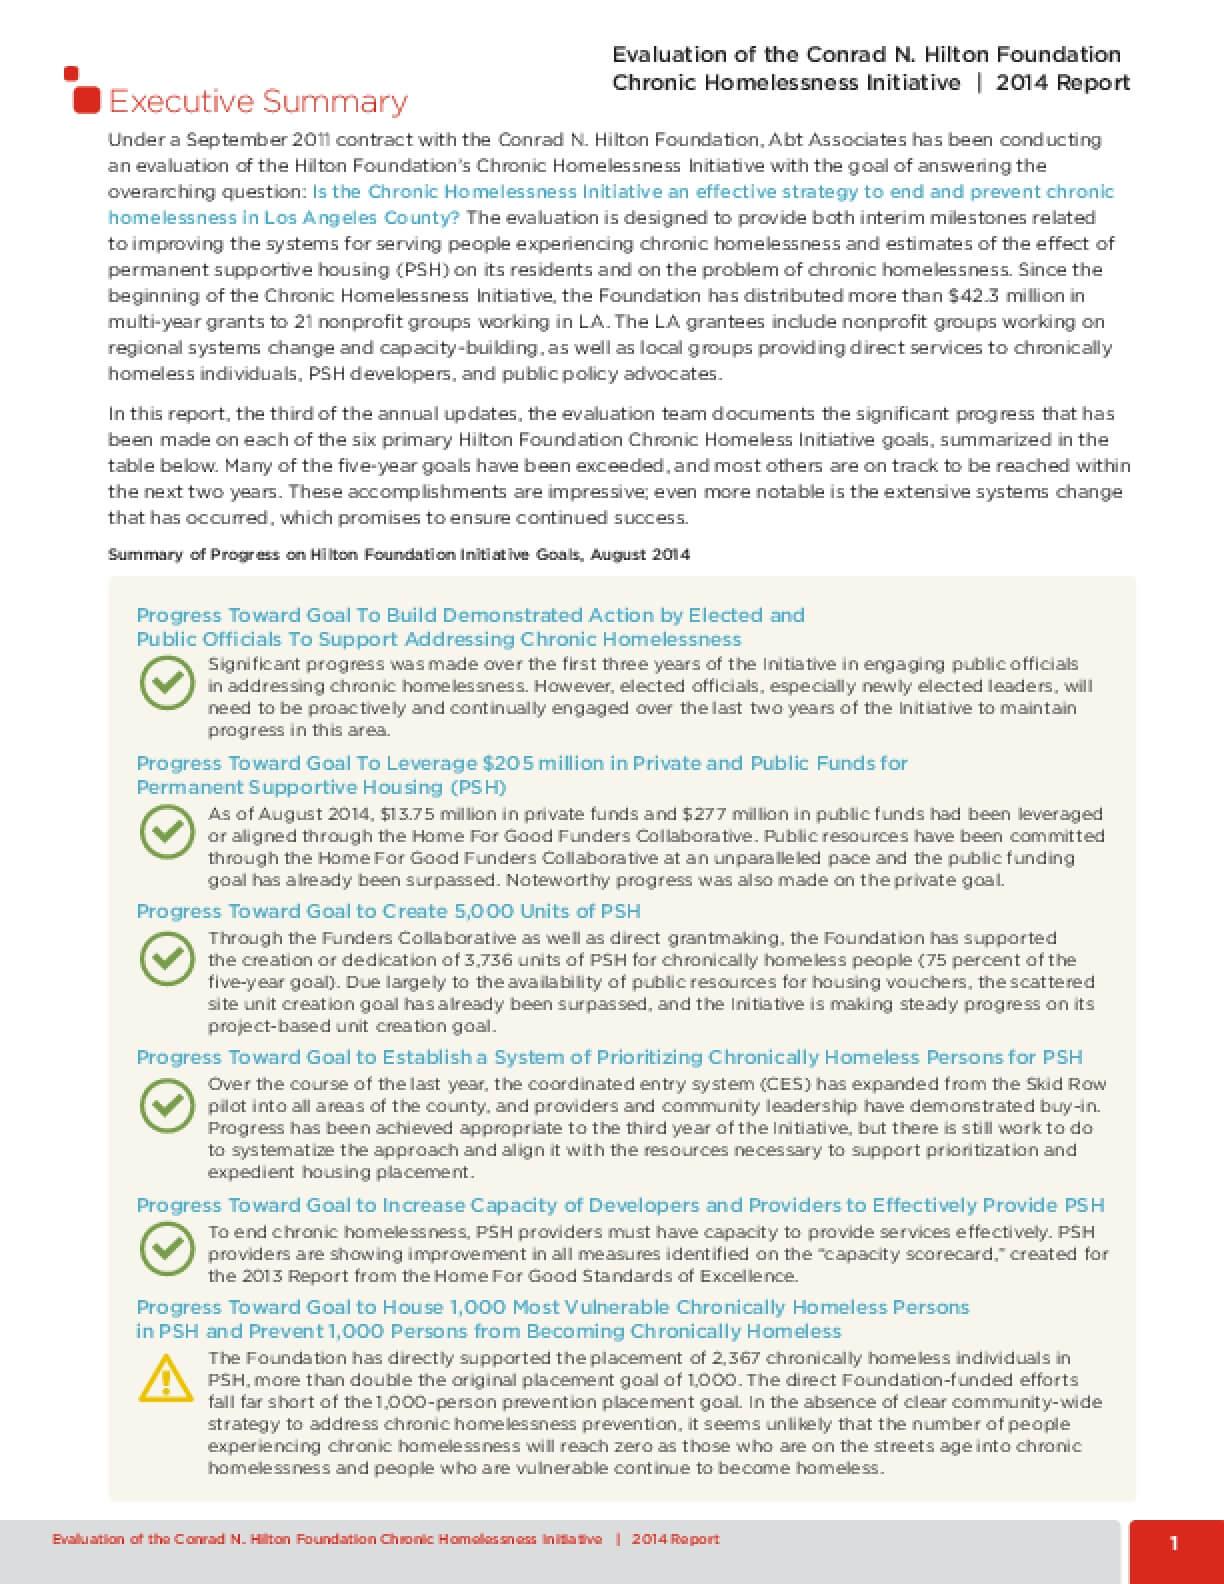 Evaluation of the Conrad N. Hilton Foundation Chronic Homelessness Initiative: 2014 Dashboard and Executive Summary